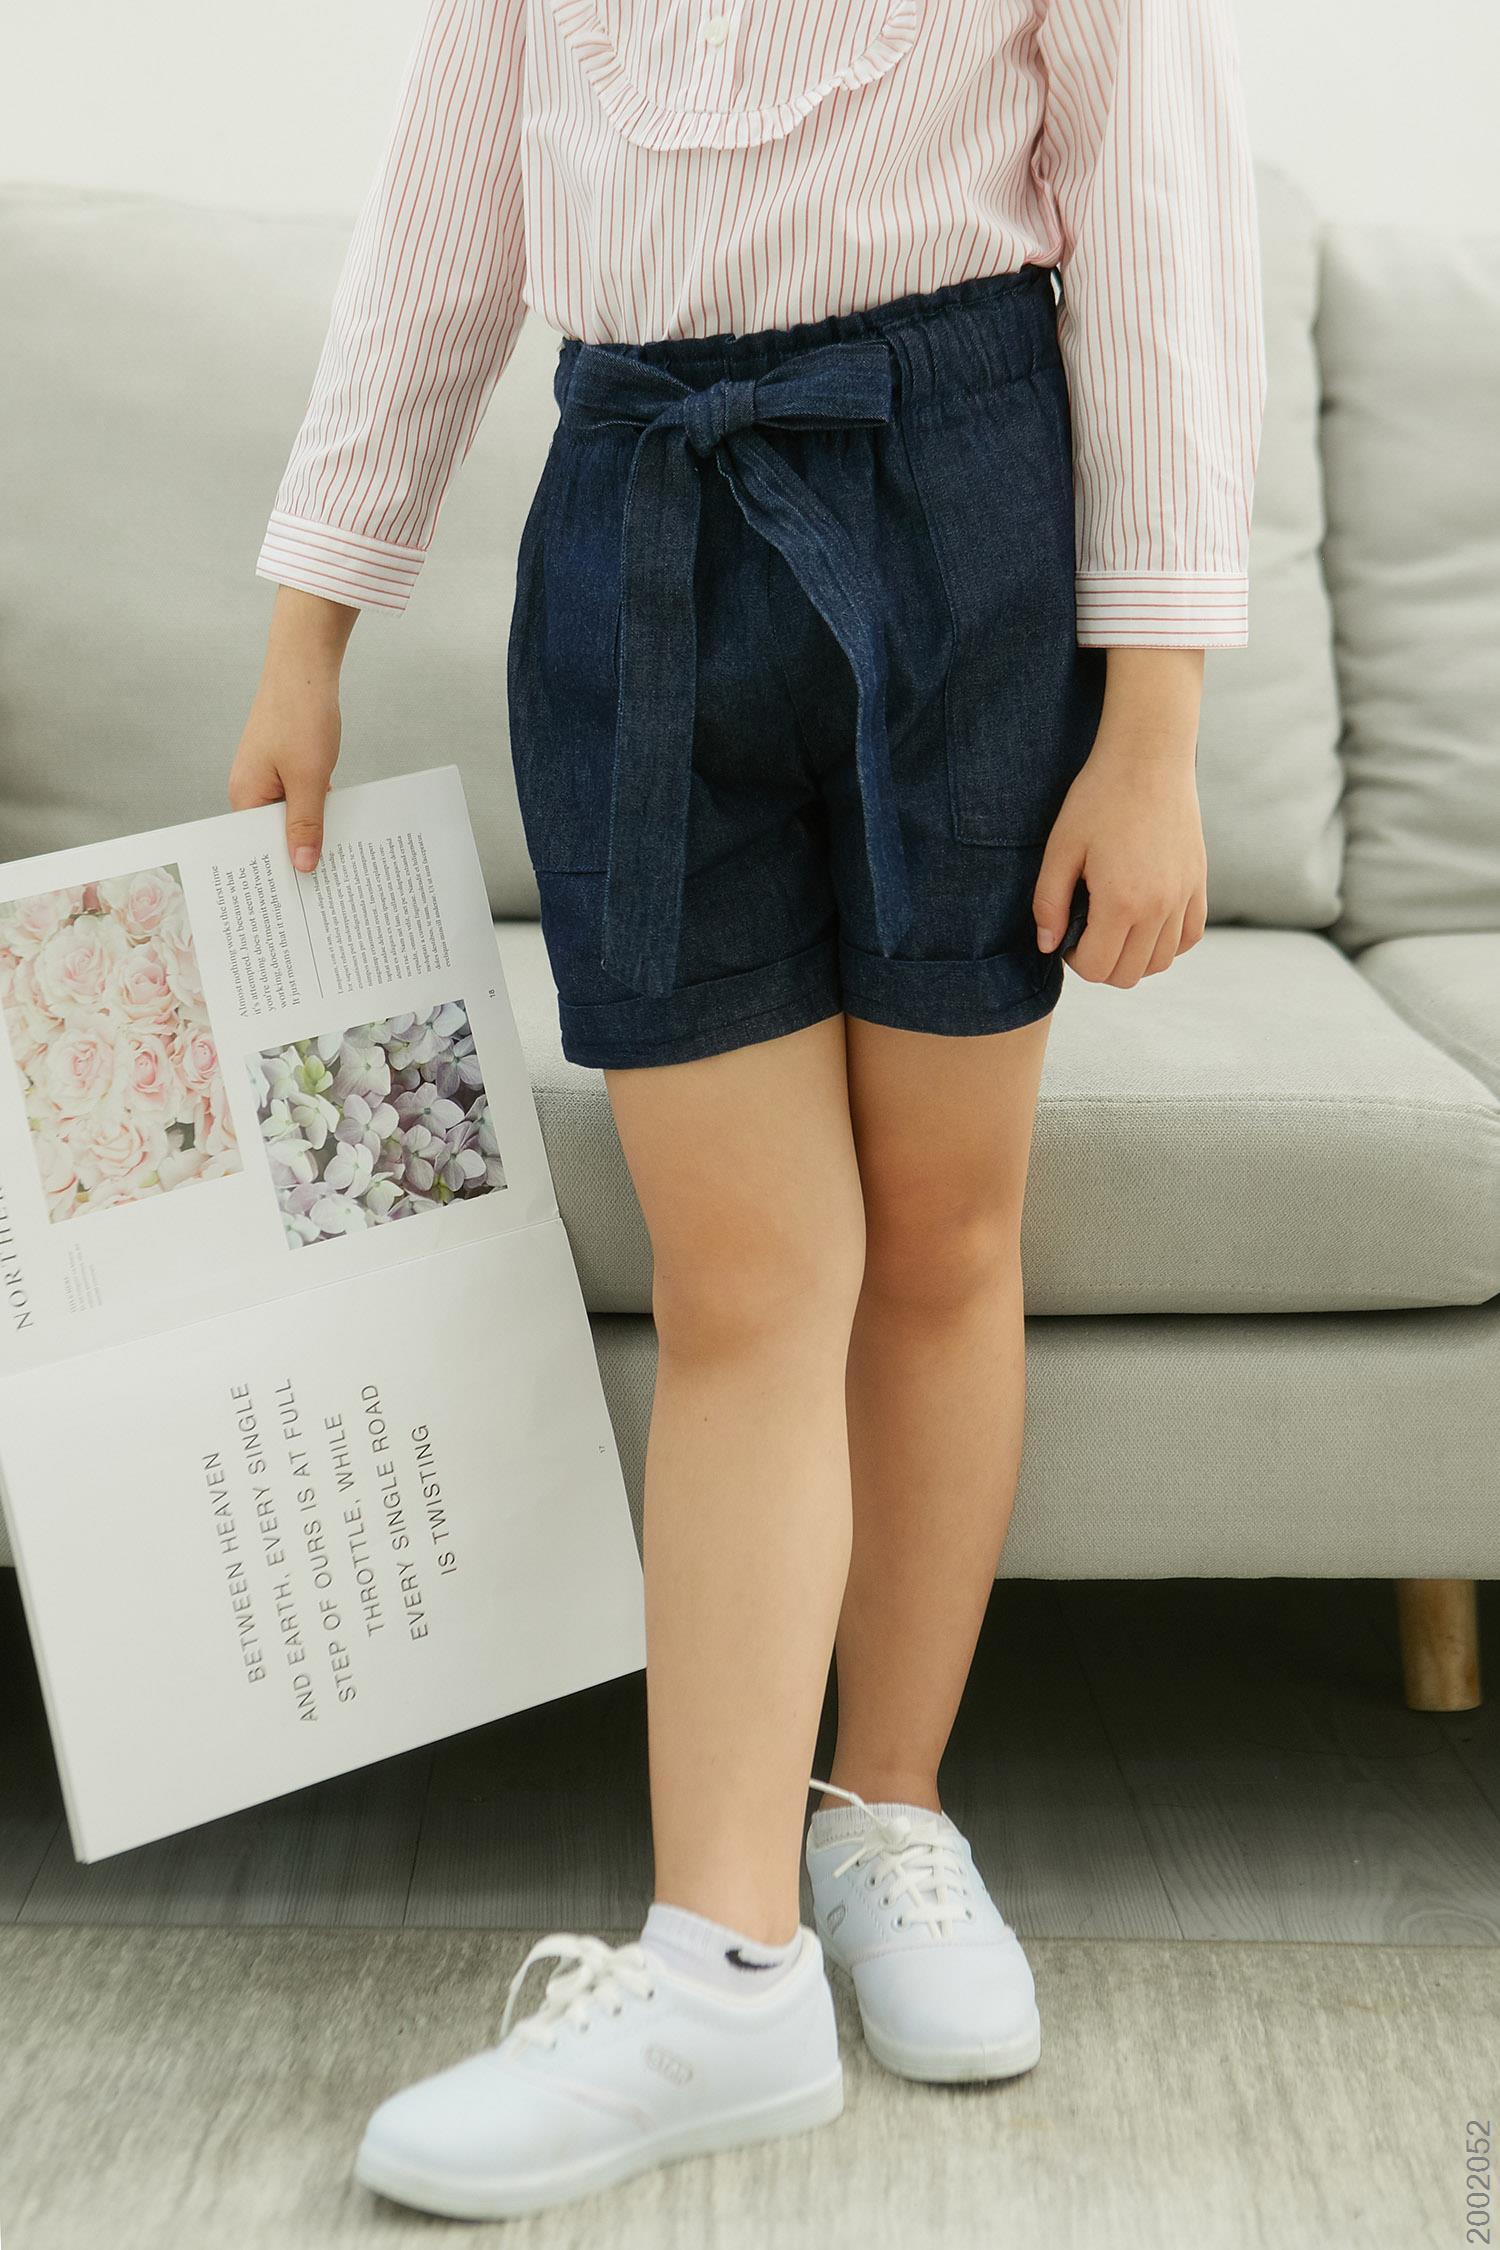 quần short bé gái - 2002052